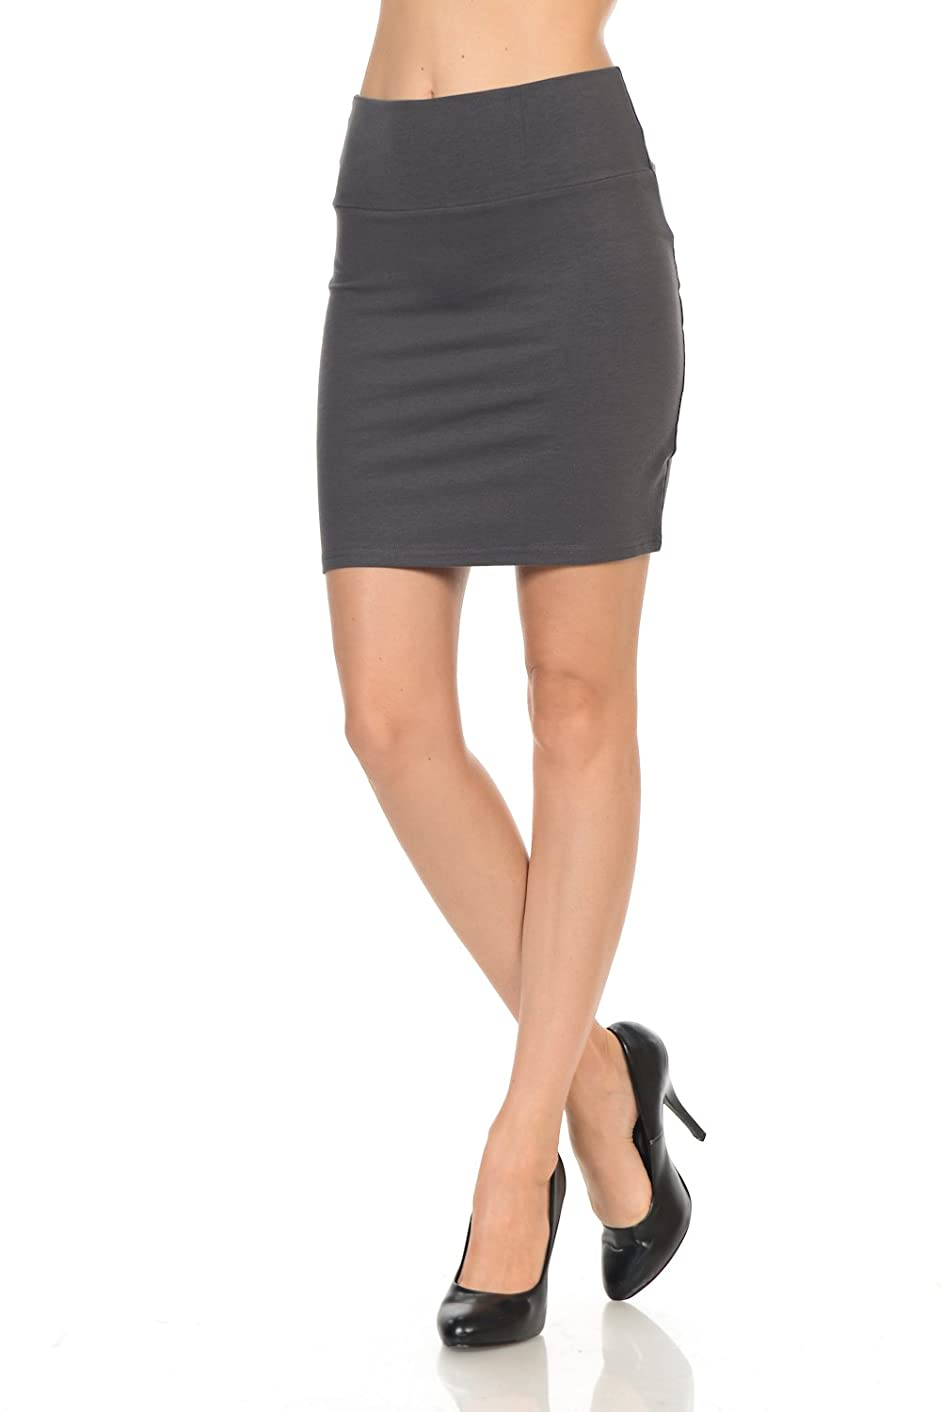 Maryclan Women's Solid High Waist Stretch Cotton Span Mini Skirt